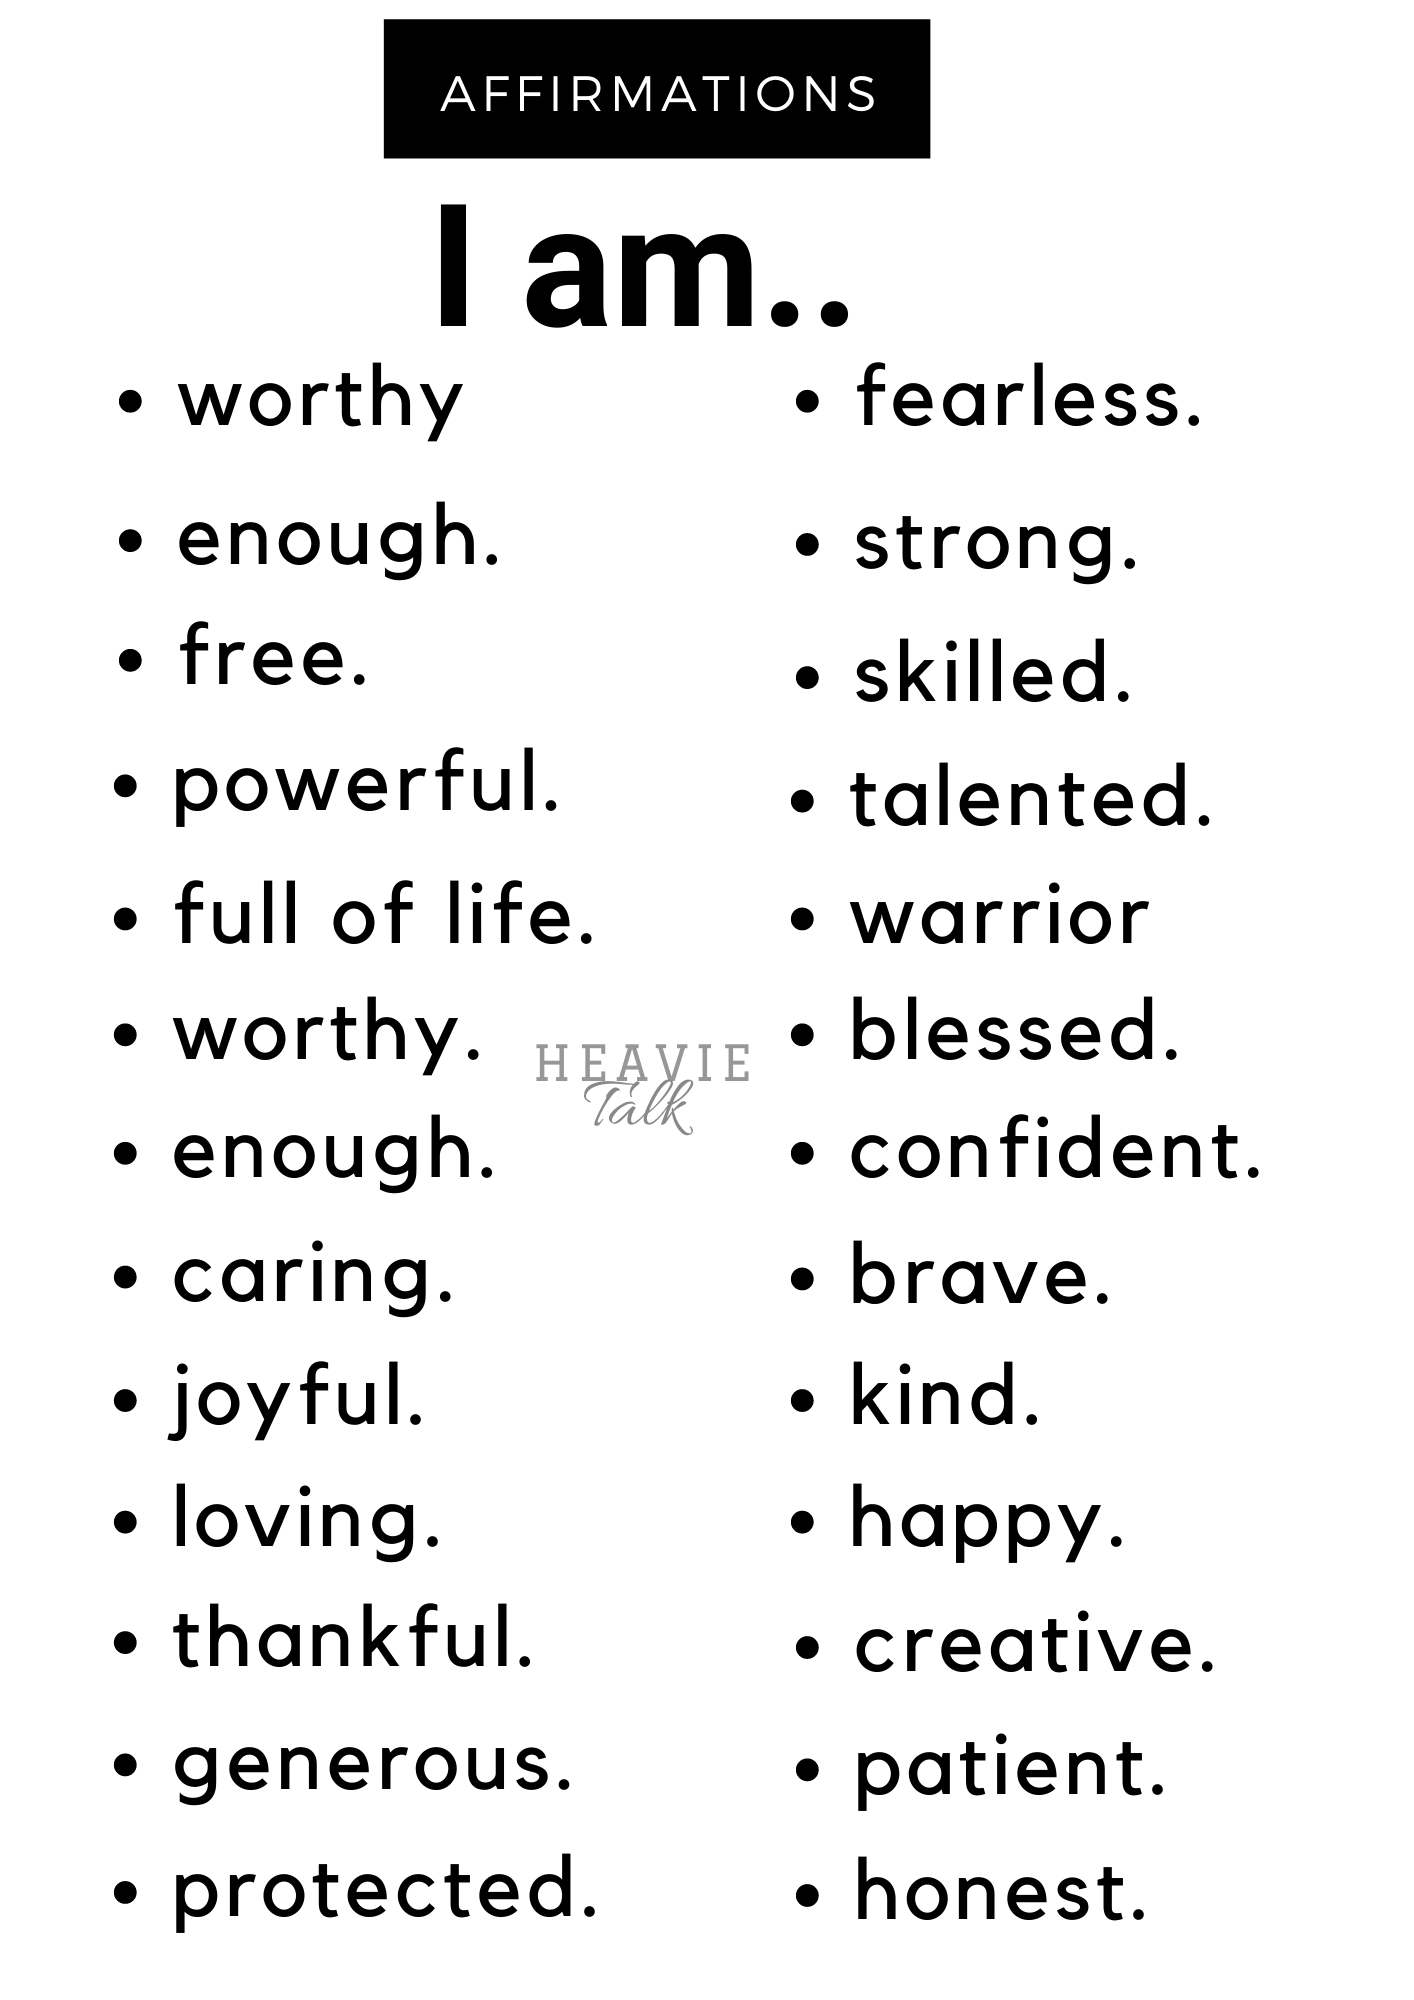 15 Uplifting Affirmations